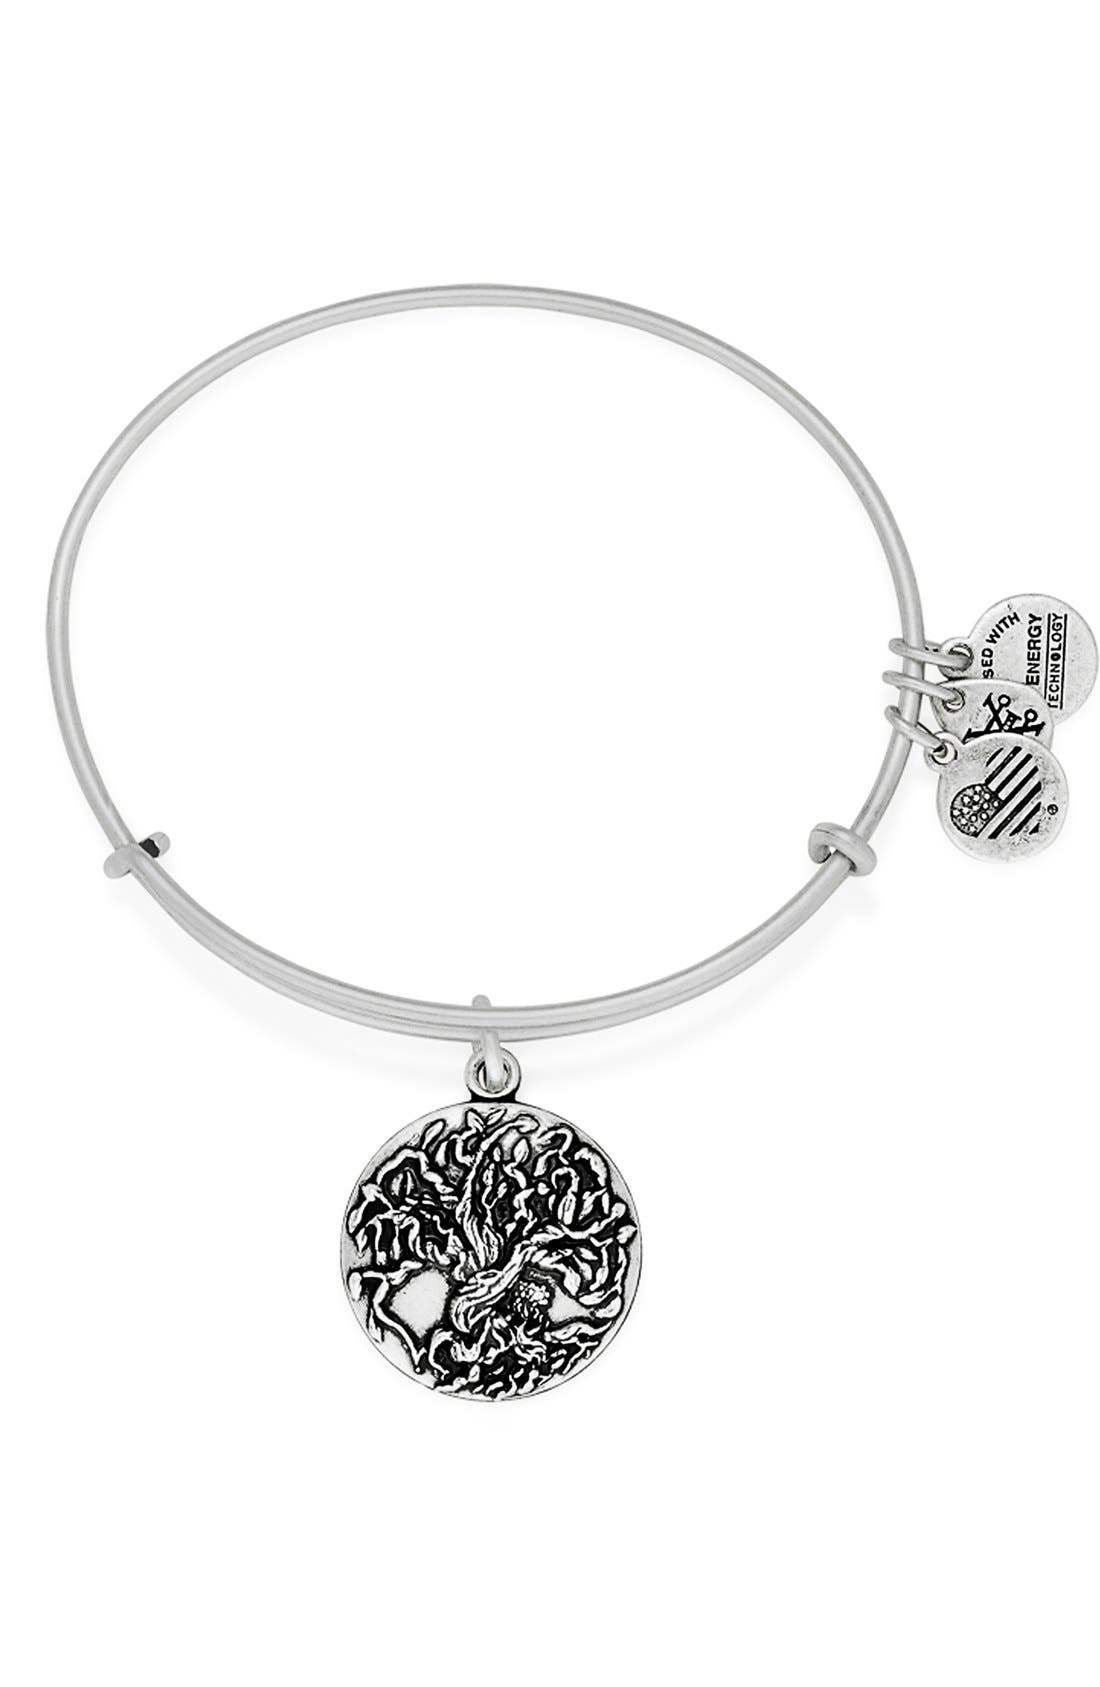 Alternate Image 1 Selected - Alex and Ani 'Tree of Life' Bangle Bracelet